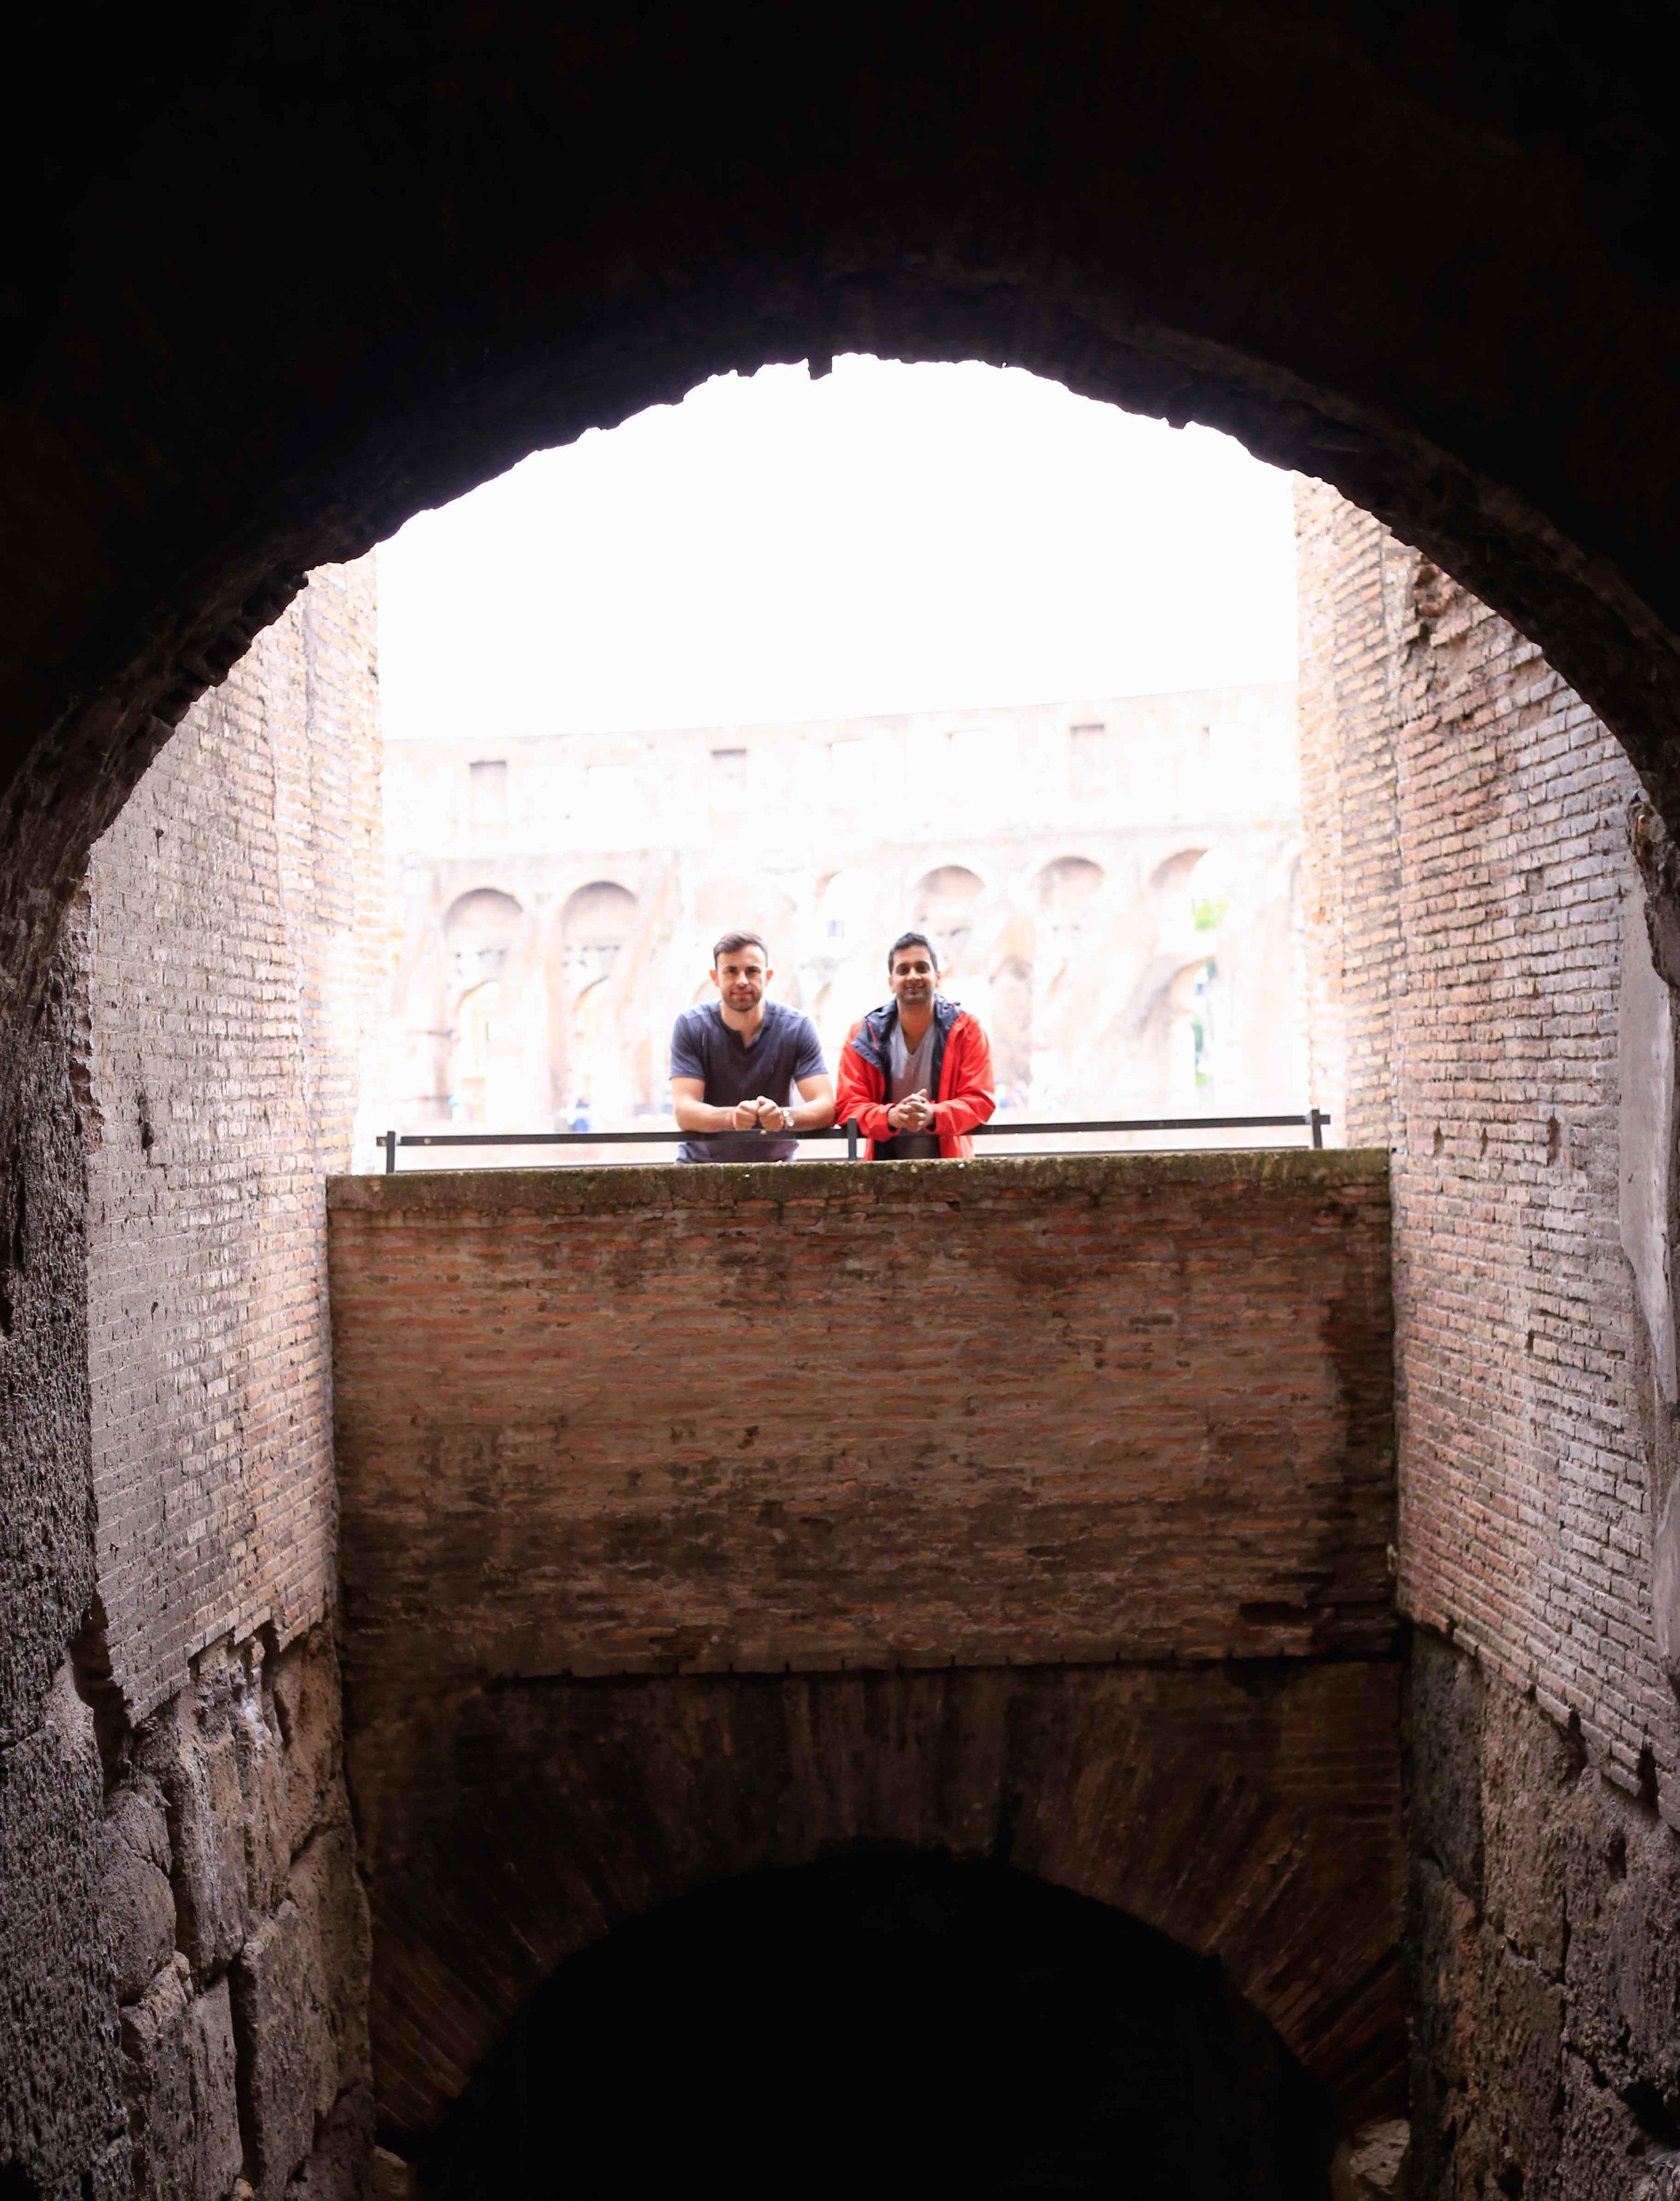 Colosseum Tour Roadtrip Through Italy Tuscany Travel Guide Charisma Shah